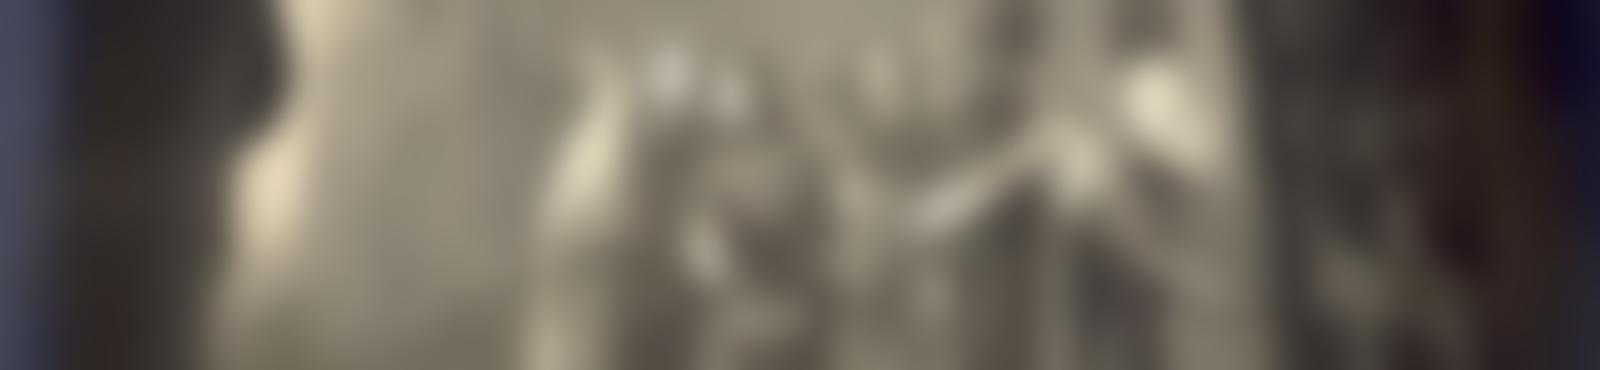 Blurred 01c1d95f e027 466a b009 771d93cacee4